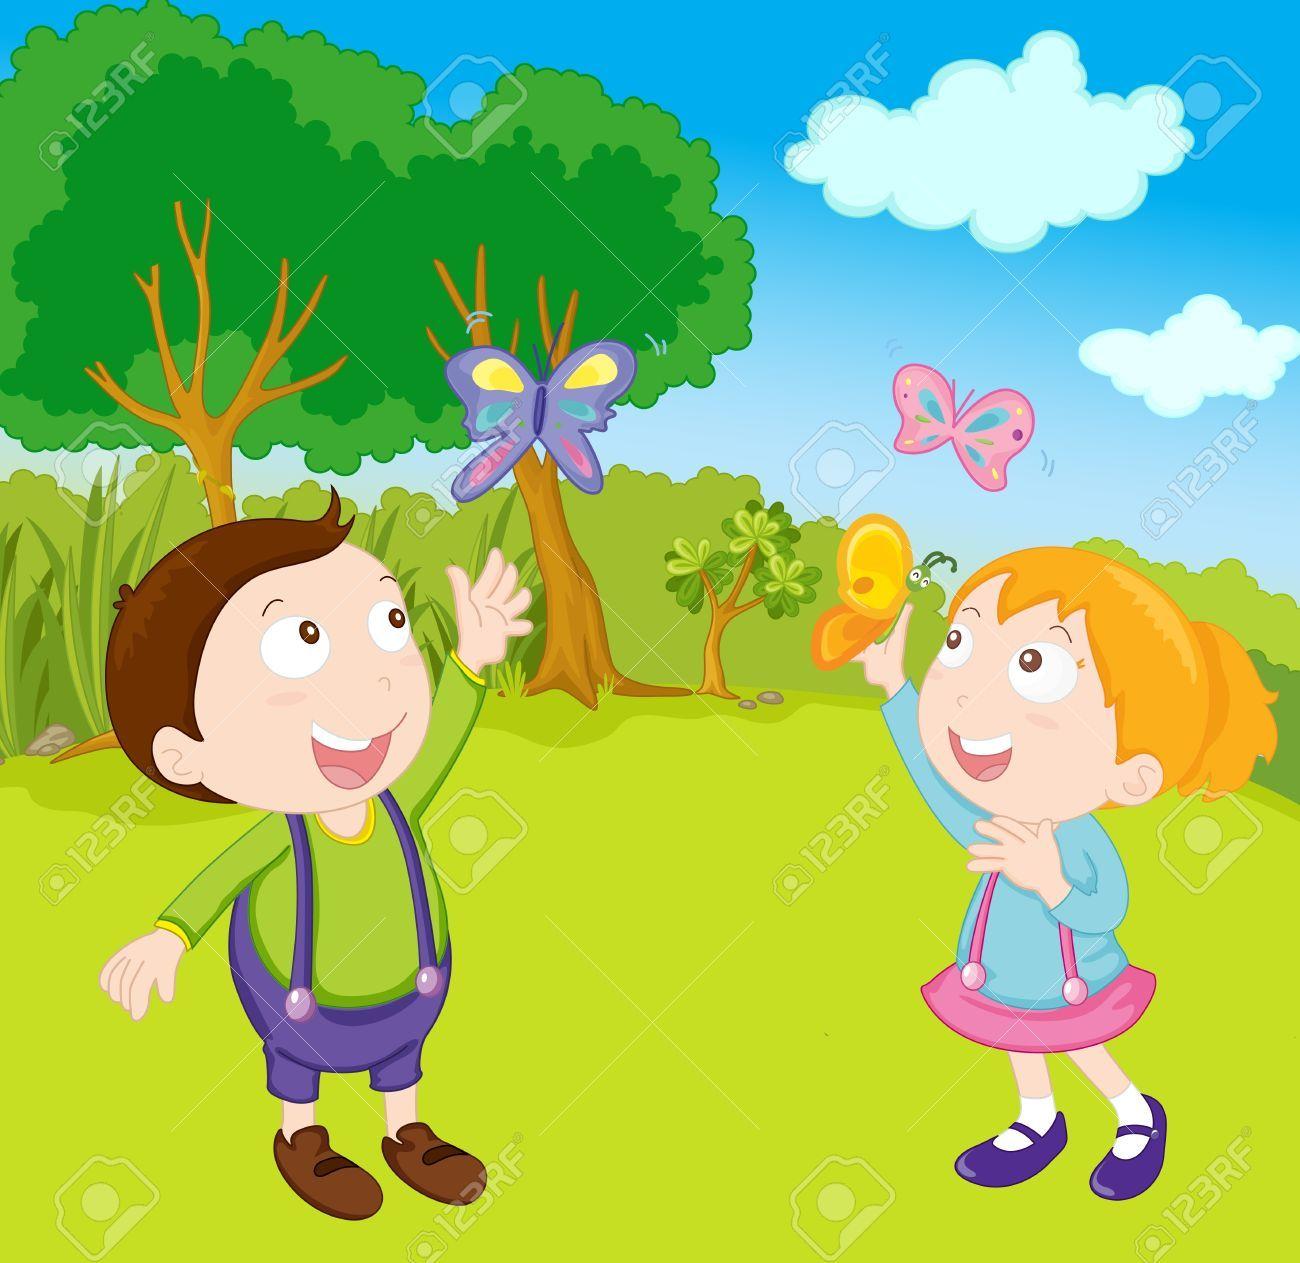 Children Playing Illustration